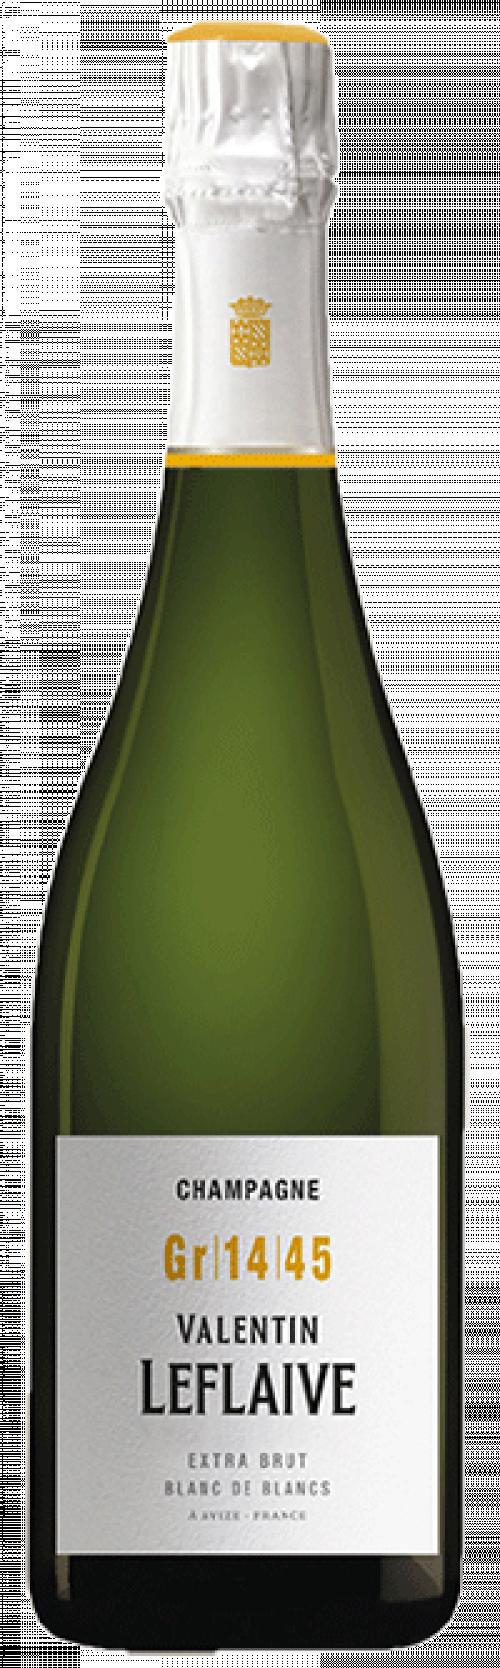 Valentin Leflaive Extra Brut Blanc de Blancs Champagne 750ml NV